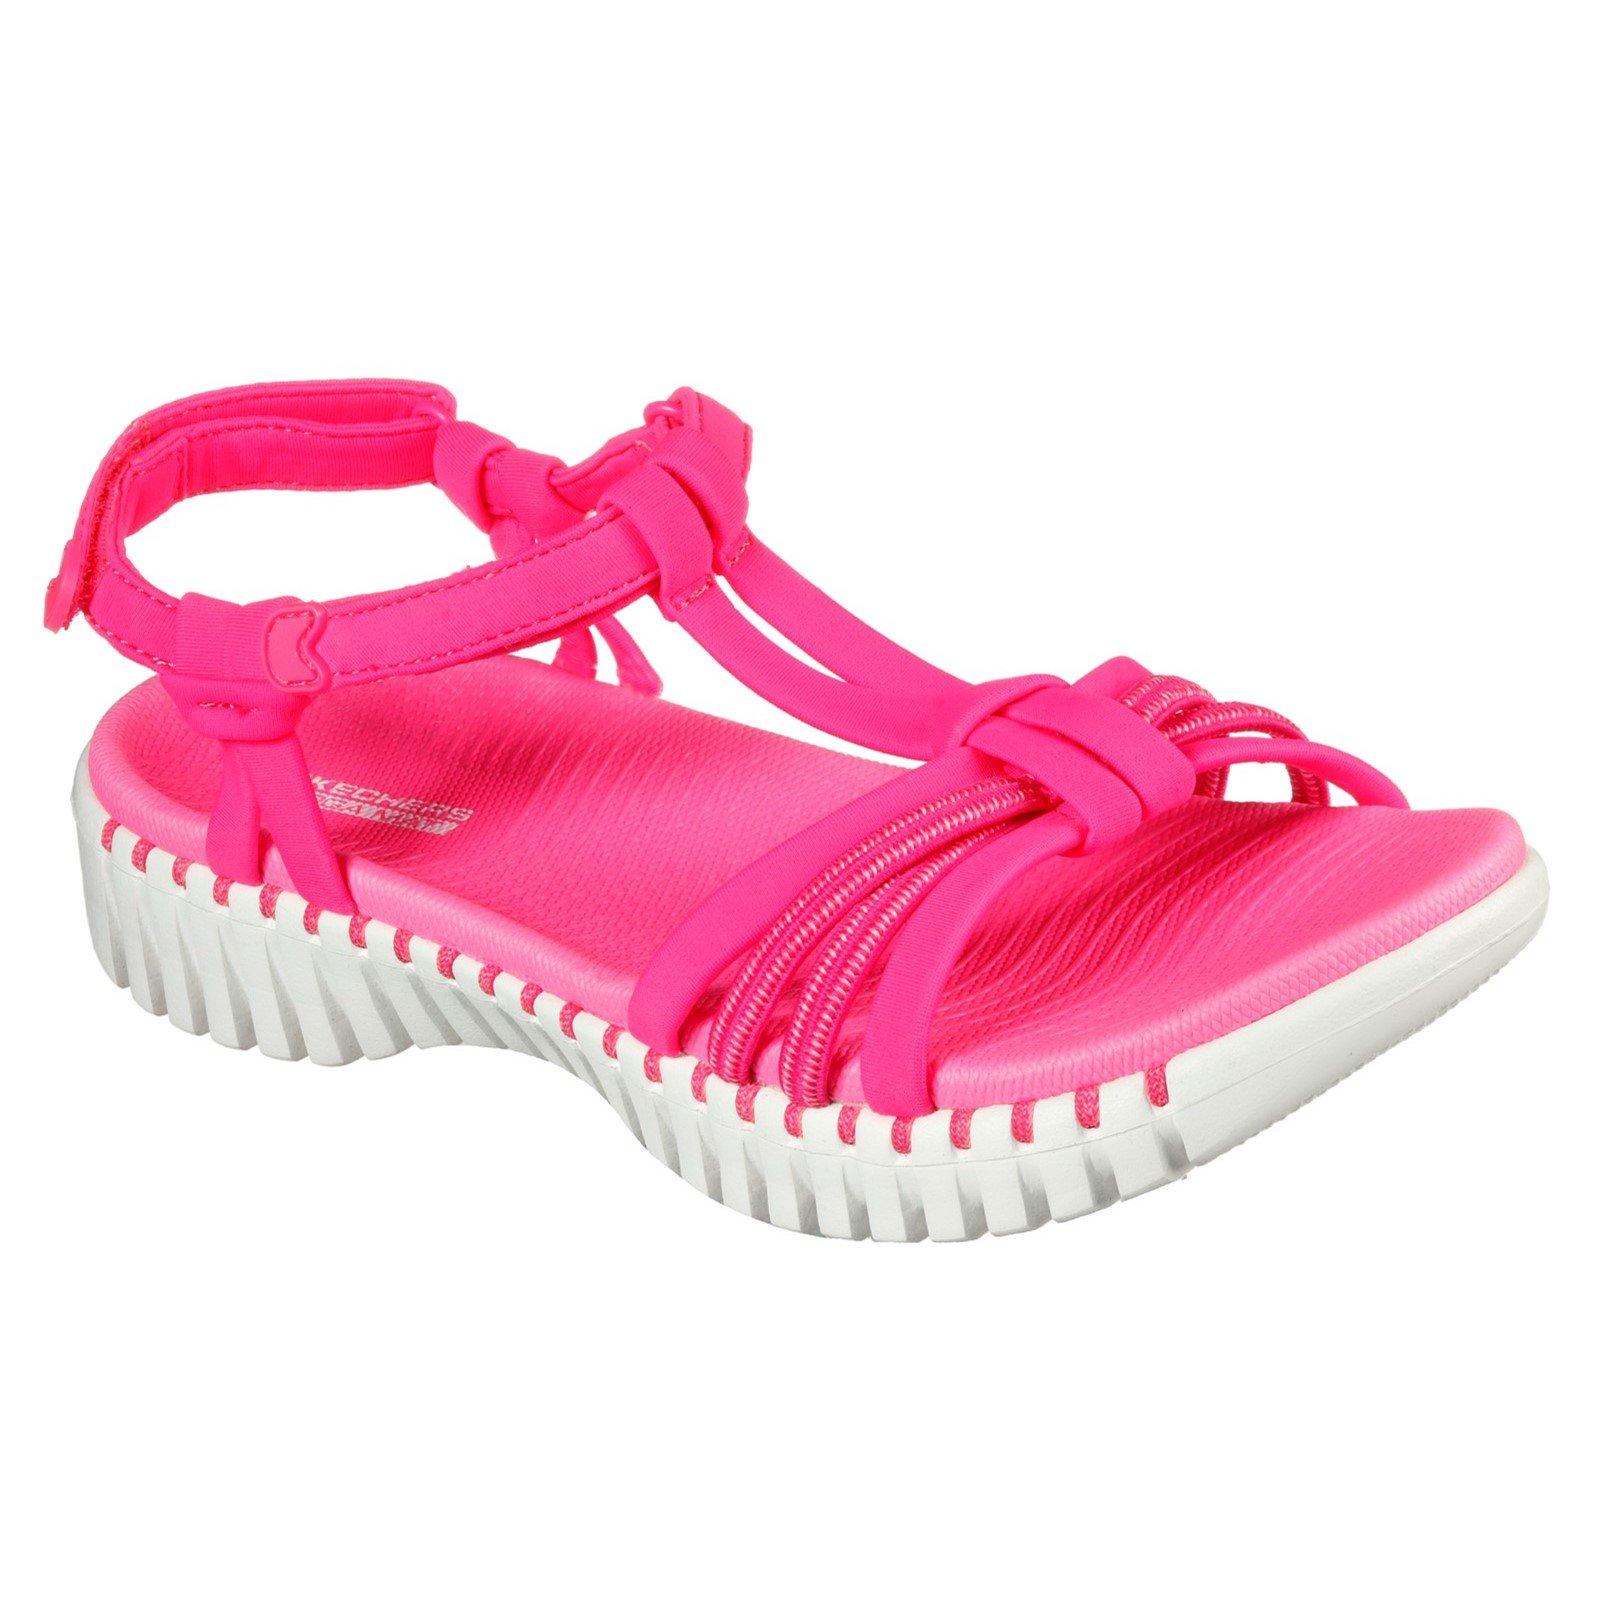 Skechers Women's Go Walk Smart Summer Sandal Various Colours 32156 - Pink 8